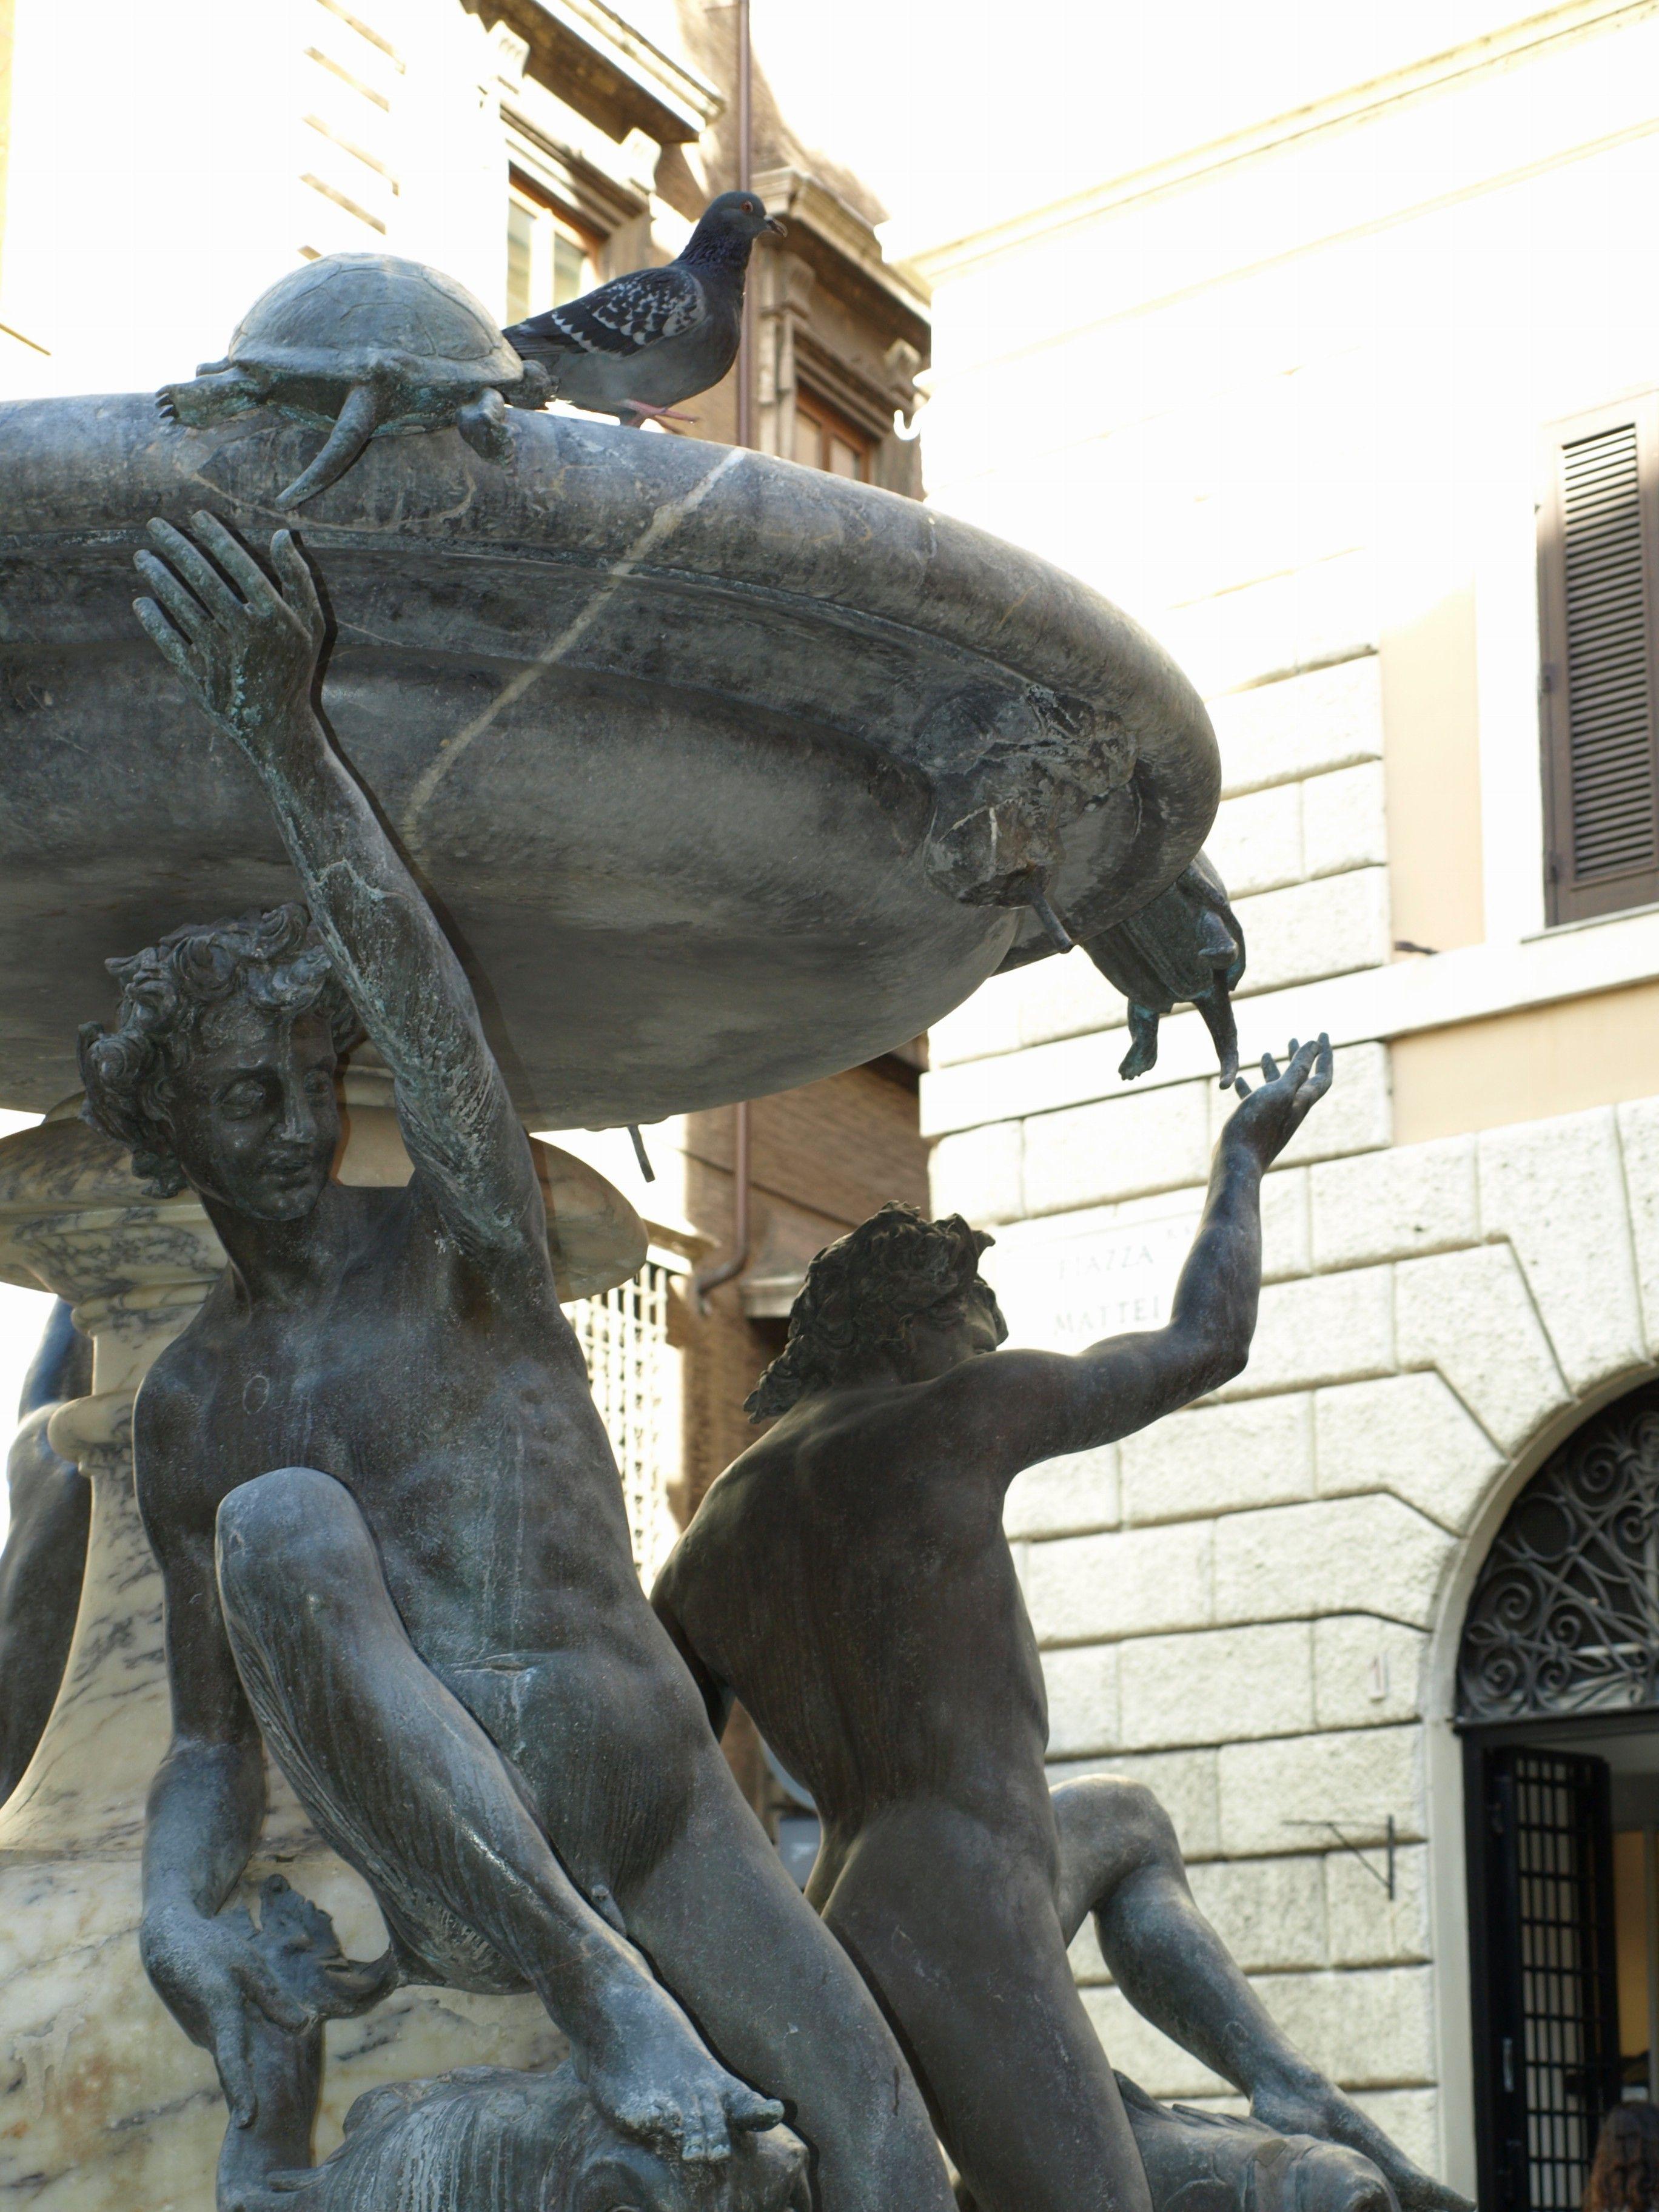 Fontana delle Tartarughe, Roma. /Tamara Velázquez - www.conplaplumaenbandeja.co m  http://wp.me/p3HkWS-dF